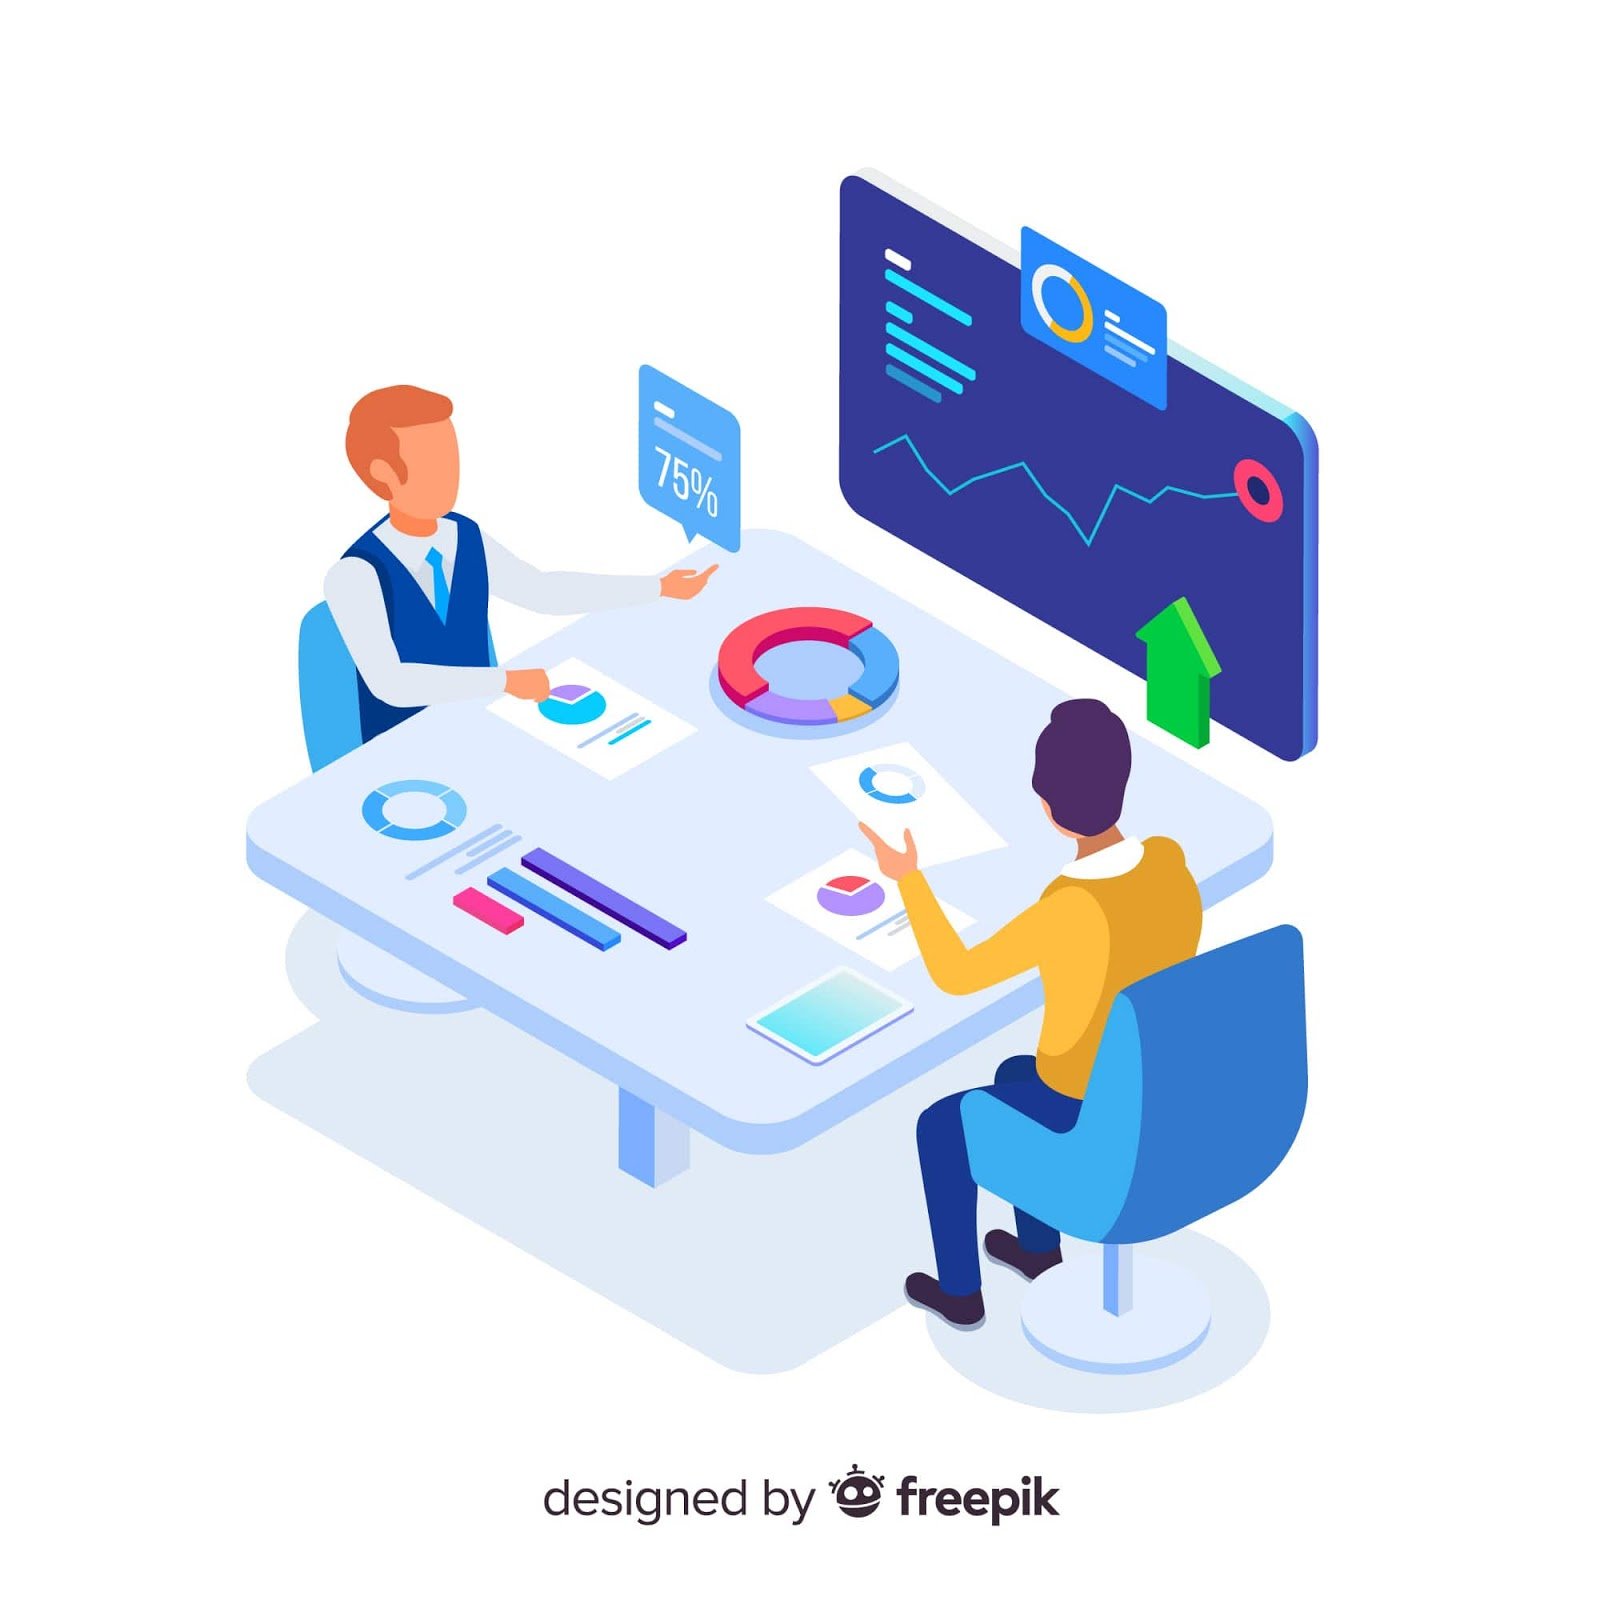 cara mengidentifikasi peluang usaha